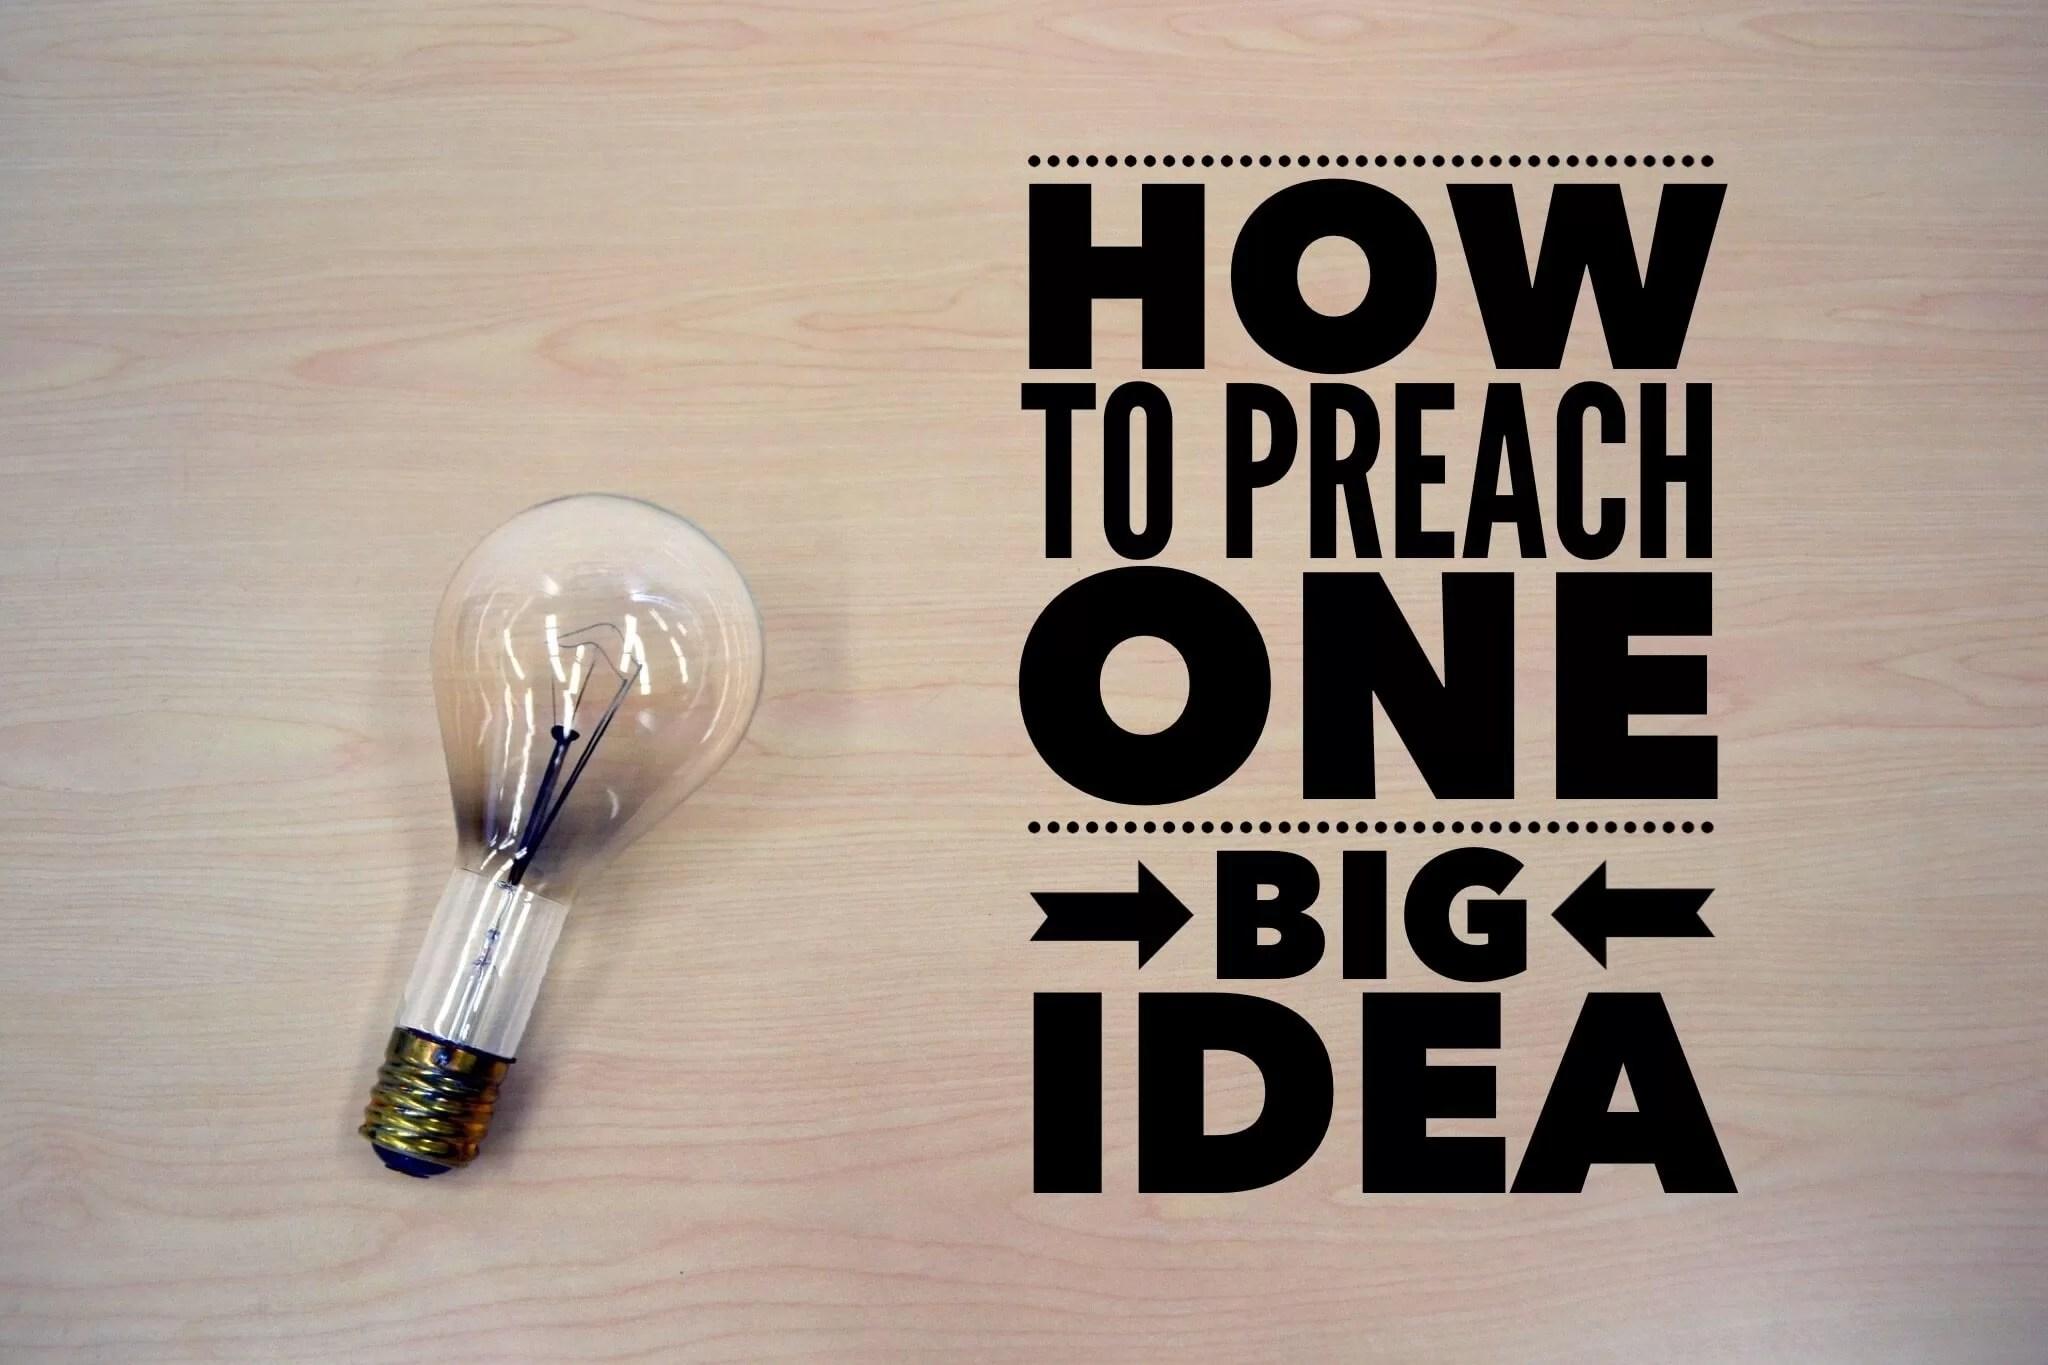 preach one big idea